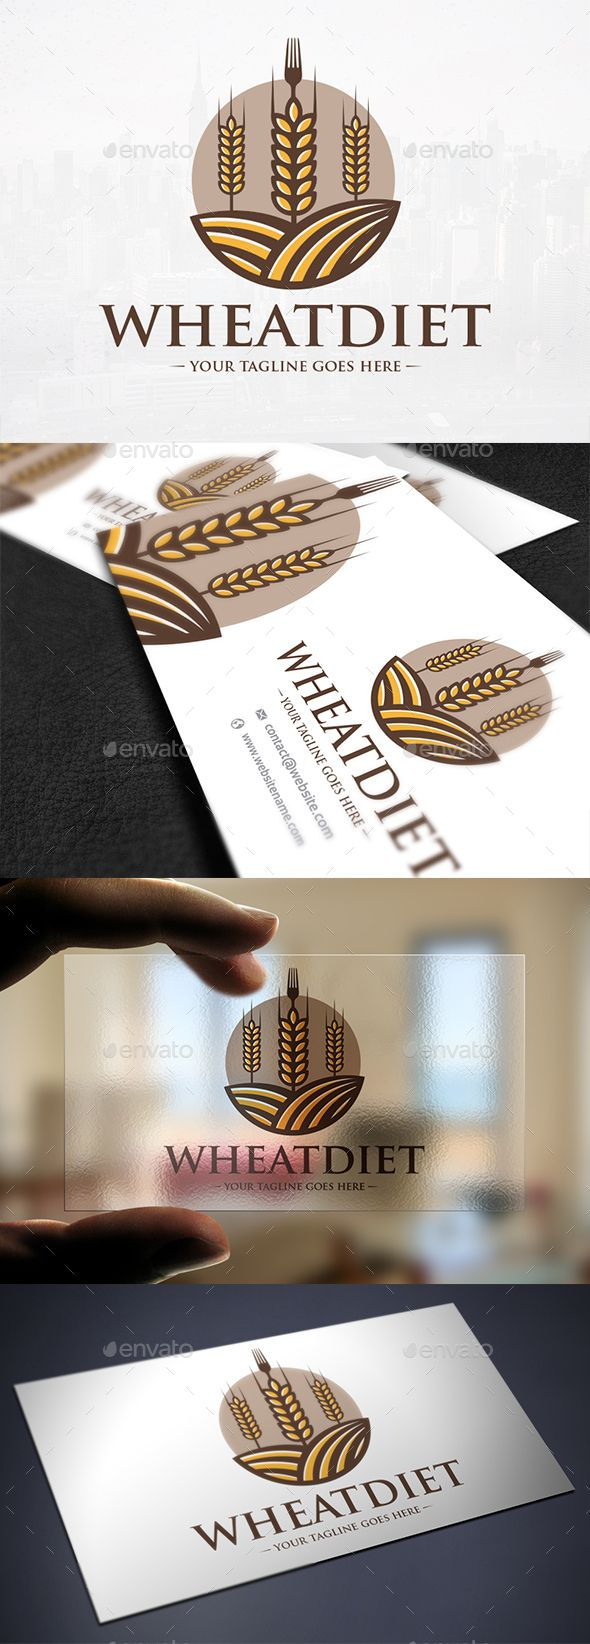 Wheat Diet Logo Template 심볼, 다이어트, 로고